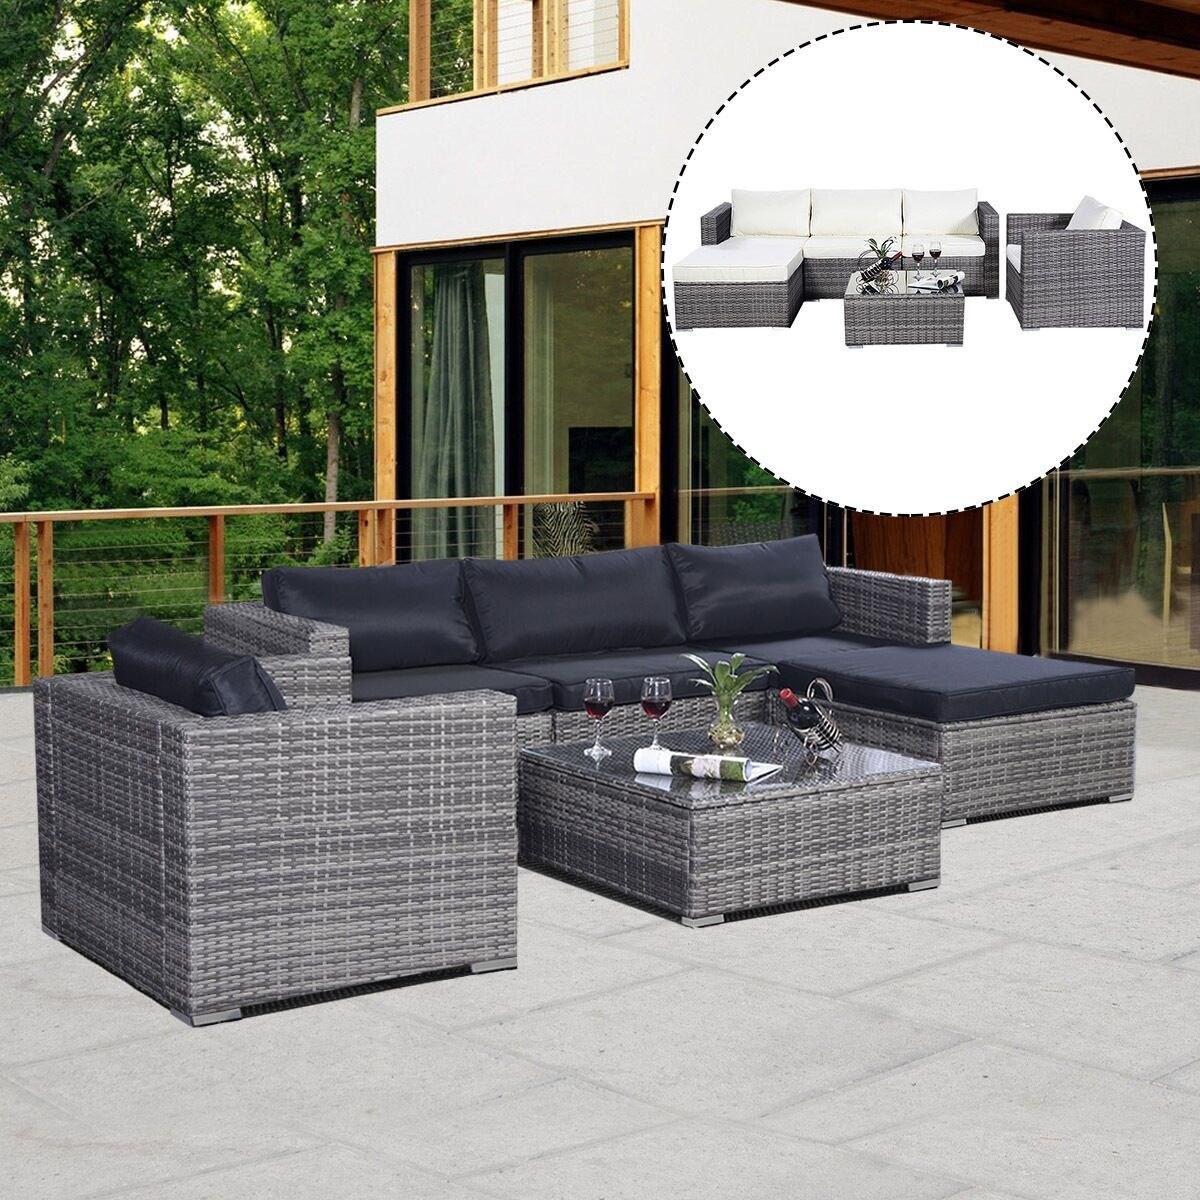 Preferred Costway 6PC Furniture Set Patio Sofa PE Gray Rattan Couch 2 Set  KQ44